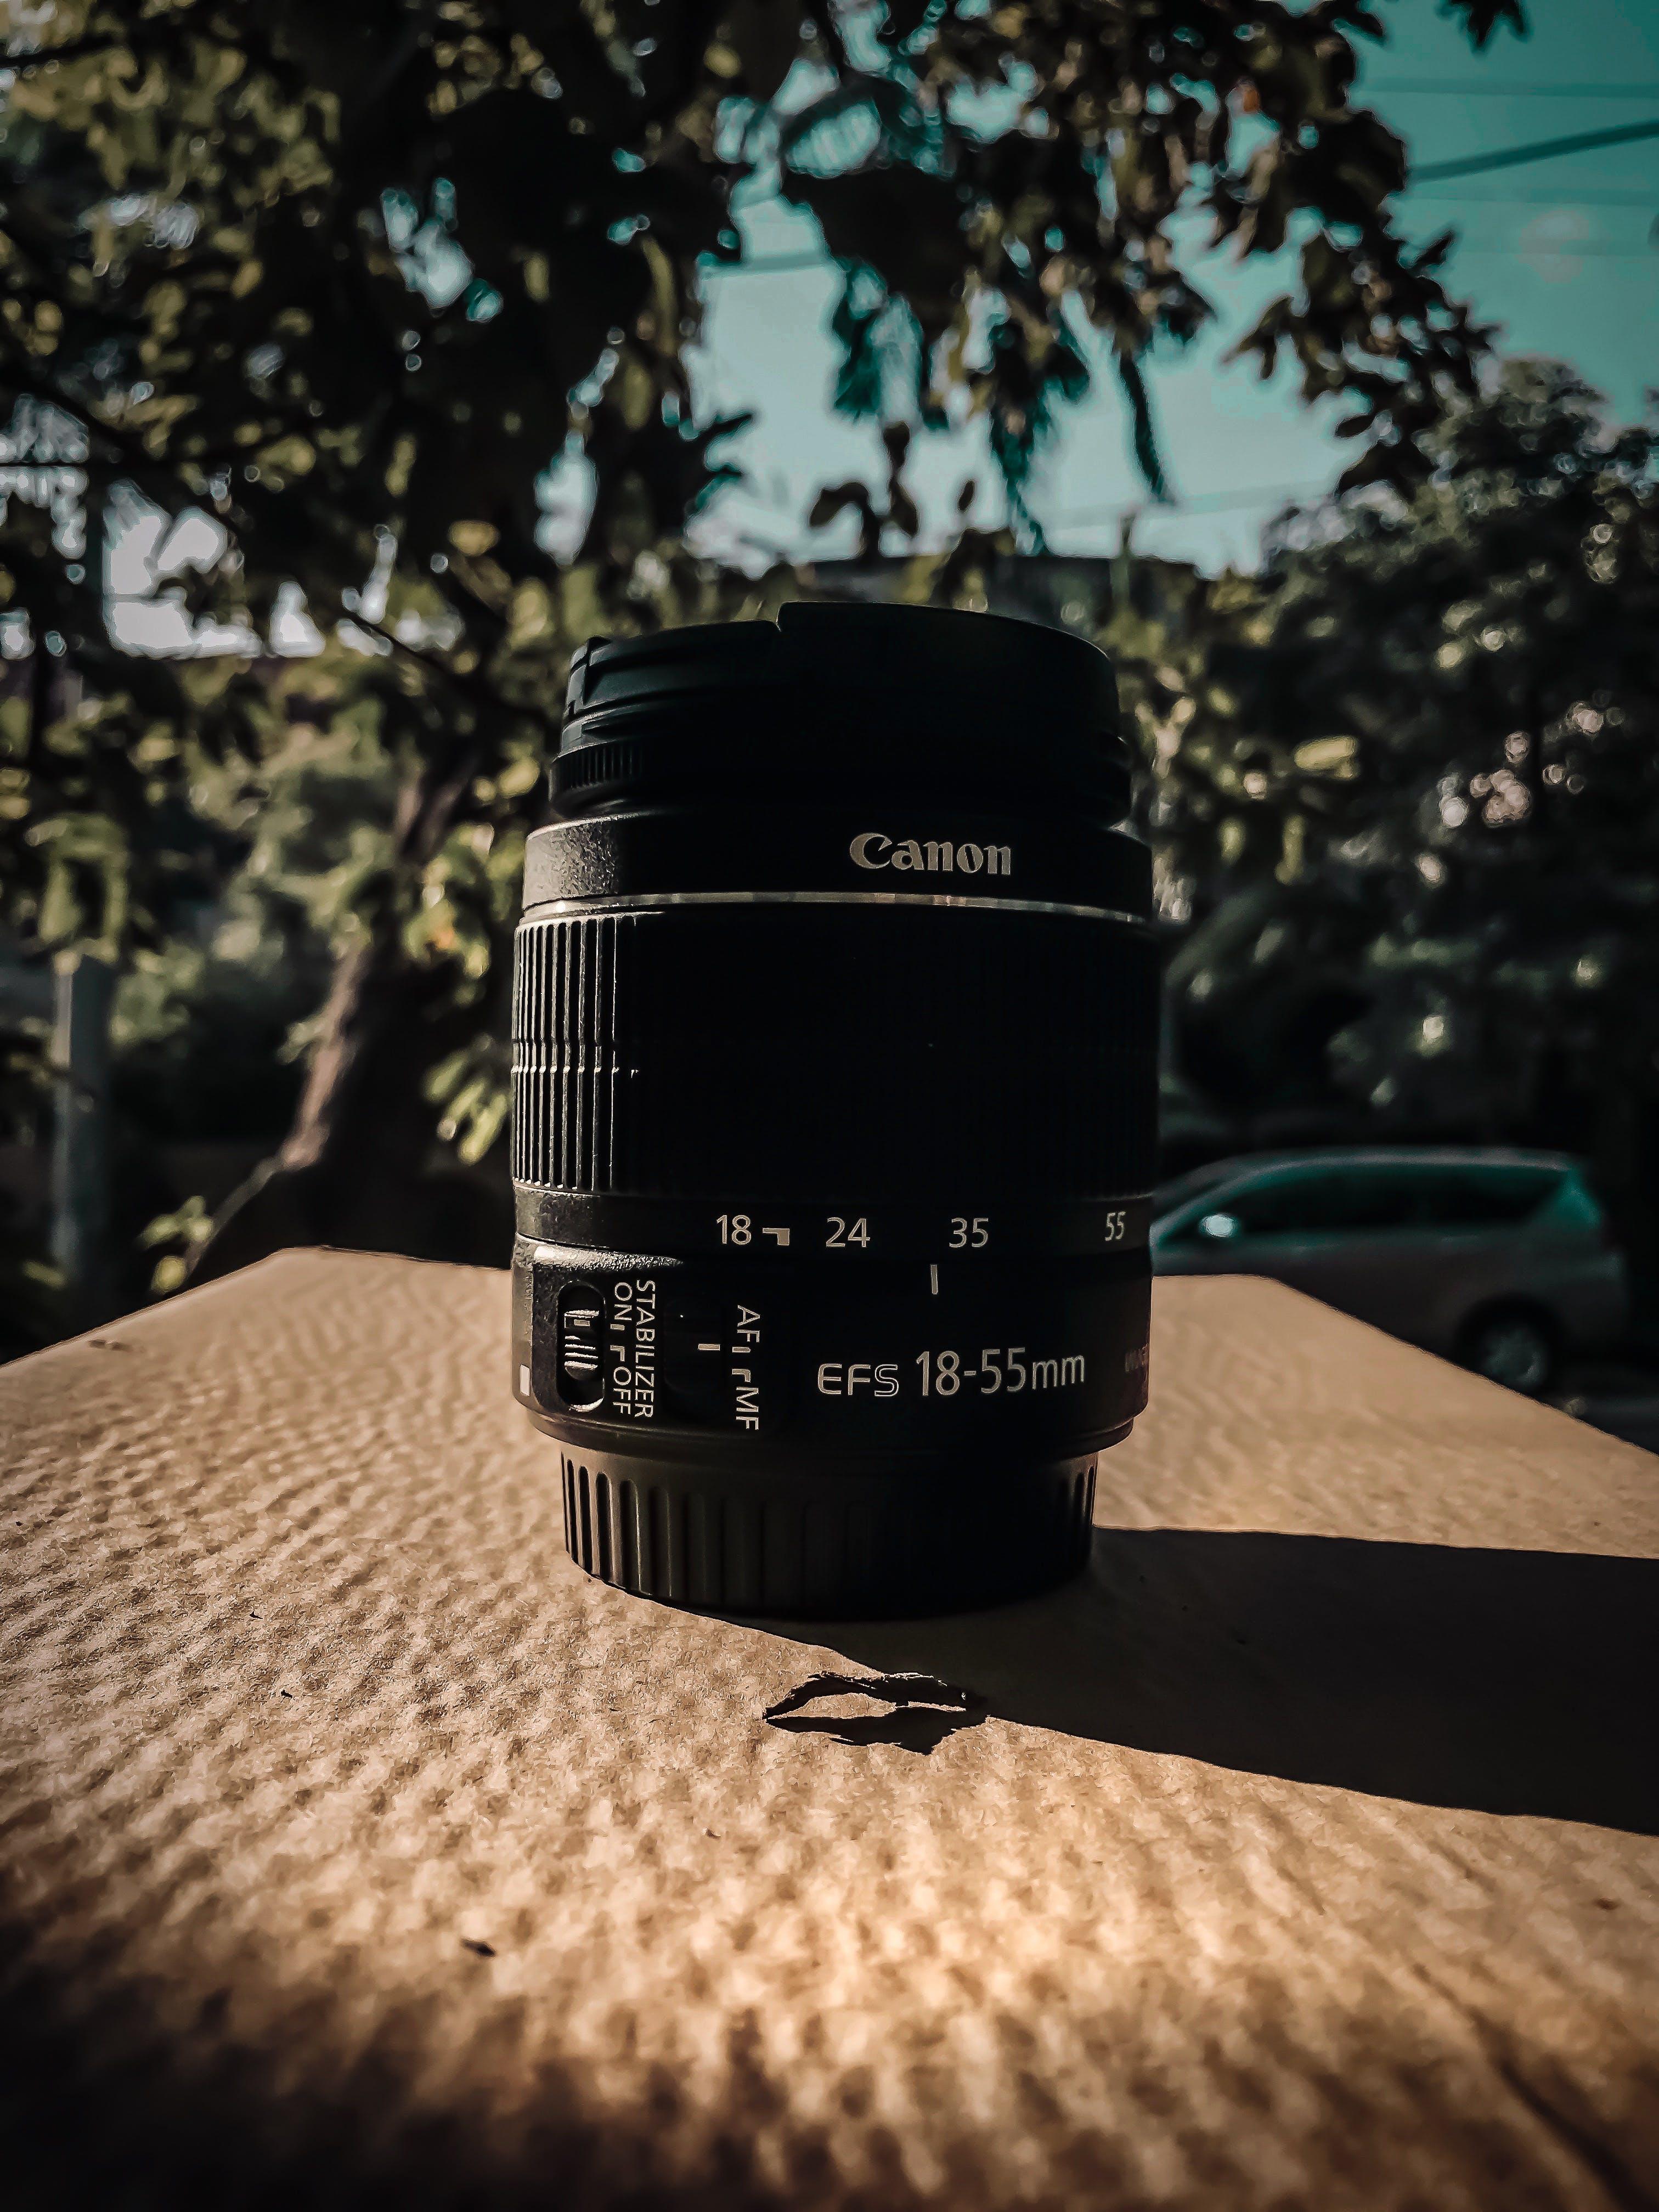 Free stock photo of #Canon, #Lens